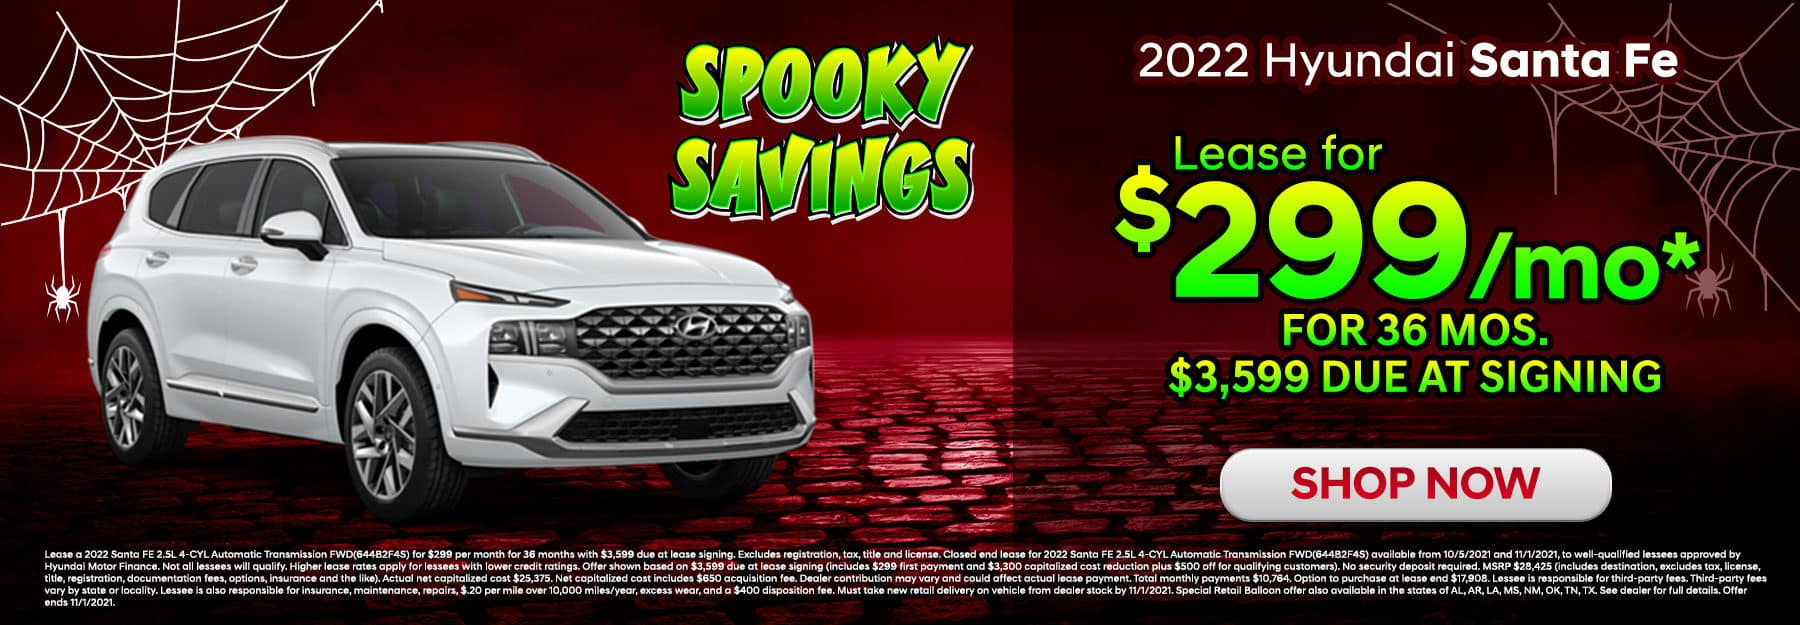 Lease a 2022 Hyundai Santa Fe for $299/mo.